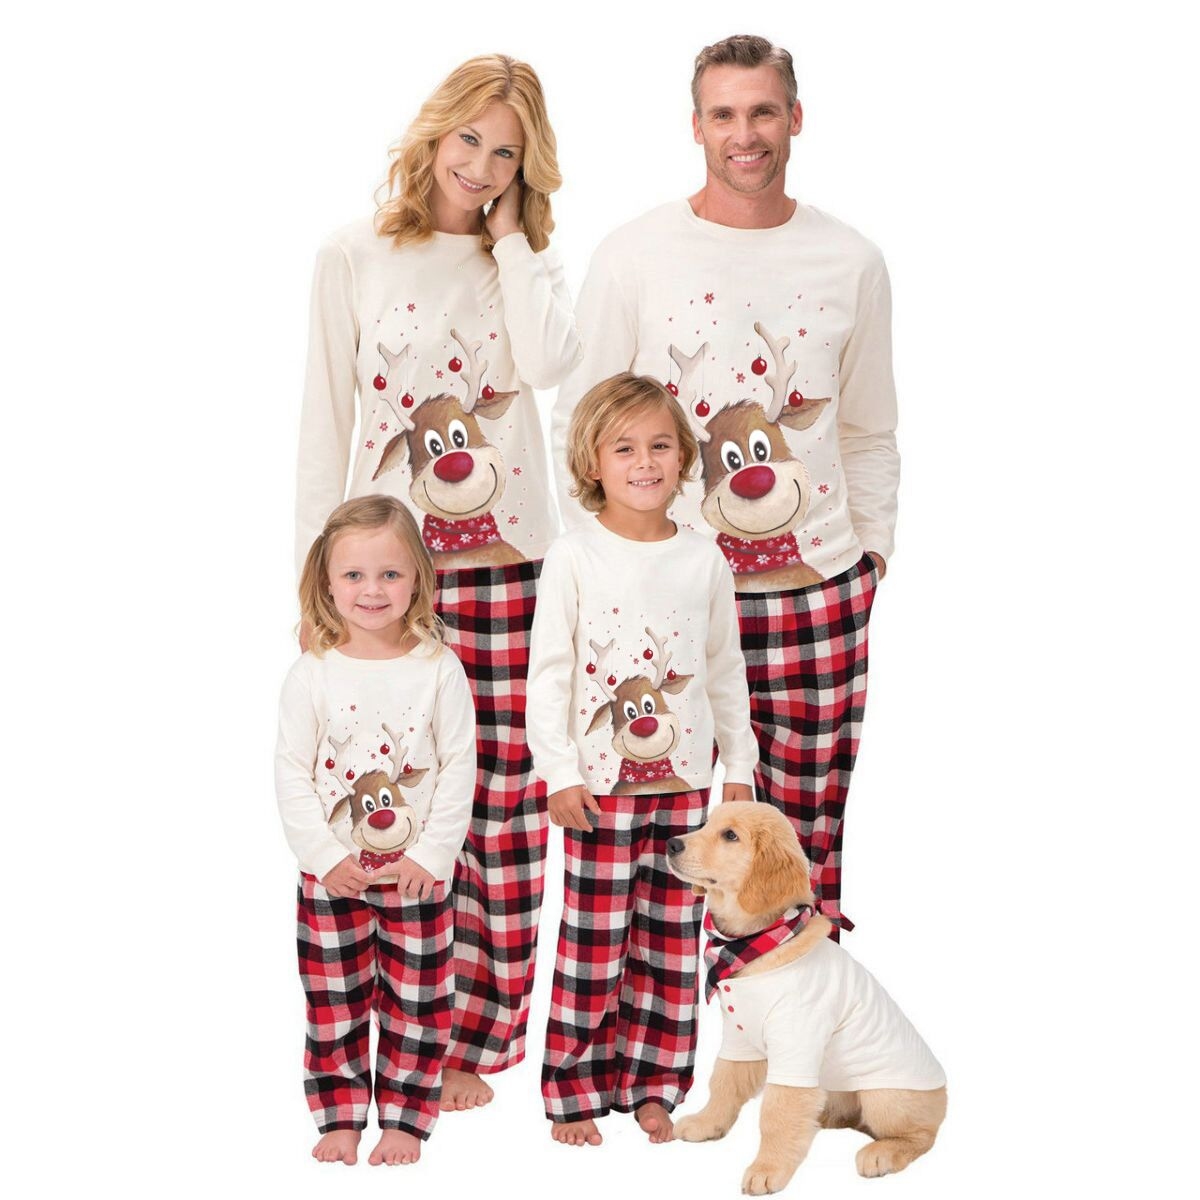 Christmas Clothes Family Christmas Pajamas XMAS Deer Print Adult Women Kids Family Matching Clothes Christmas Pajamas Family Set